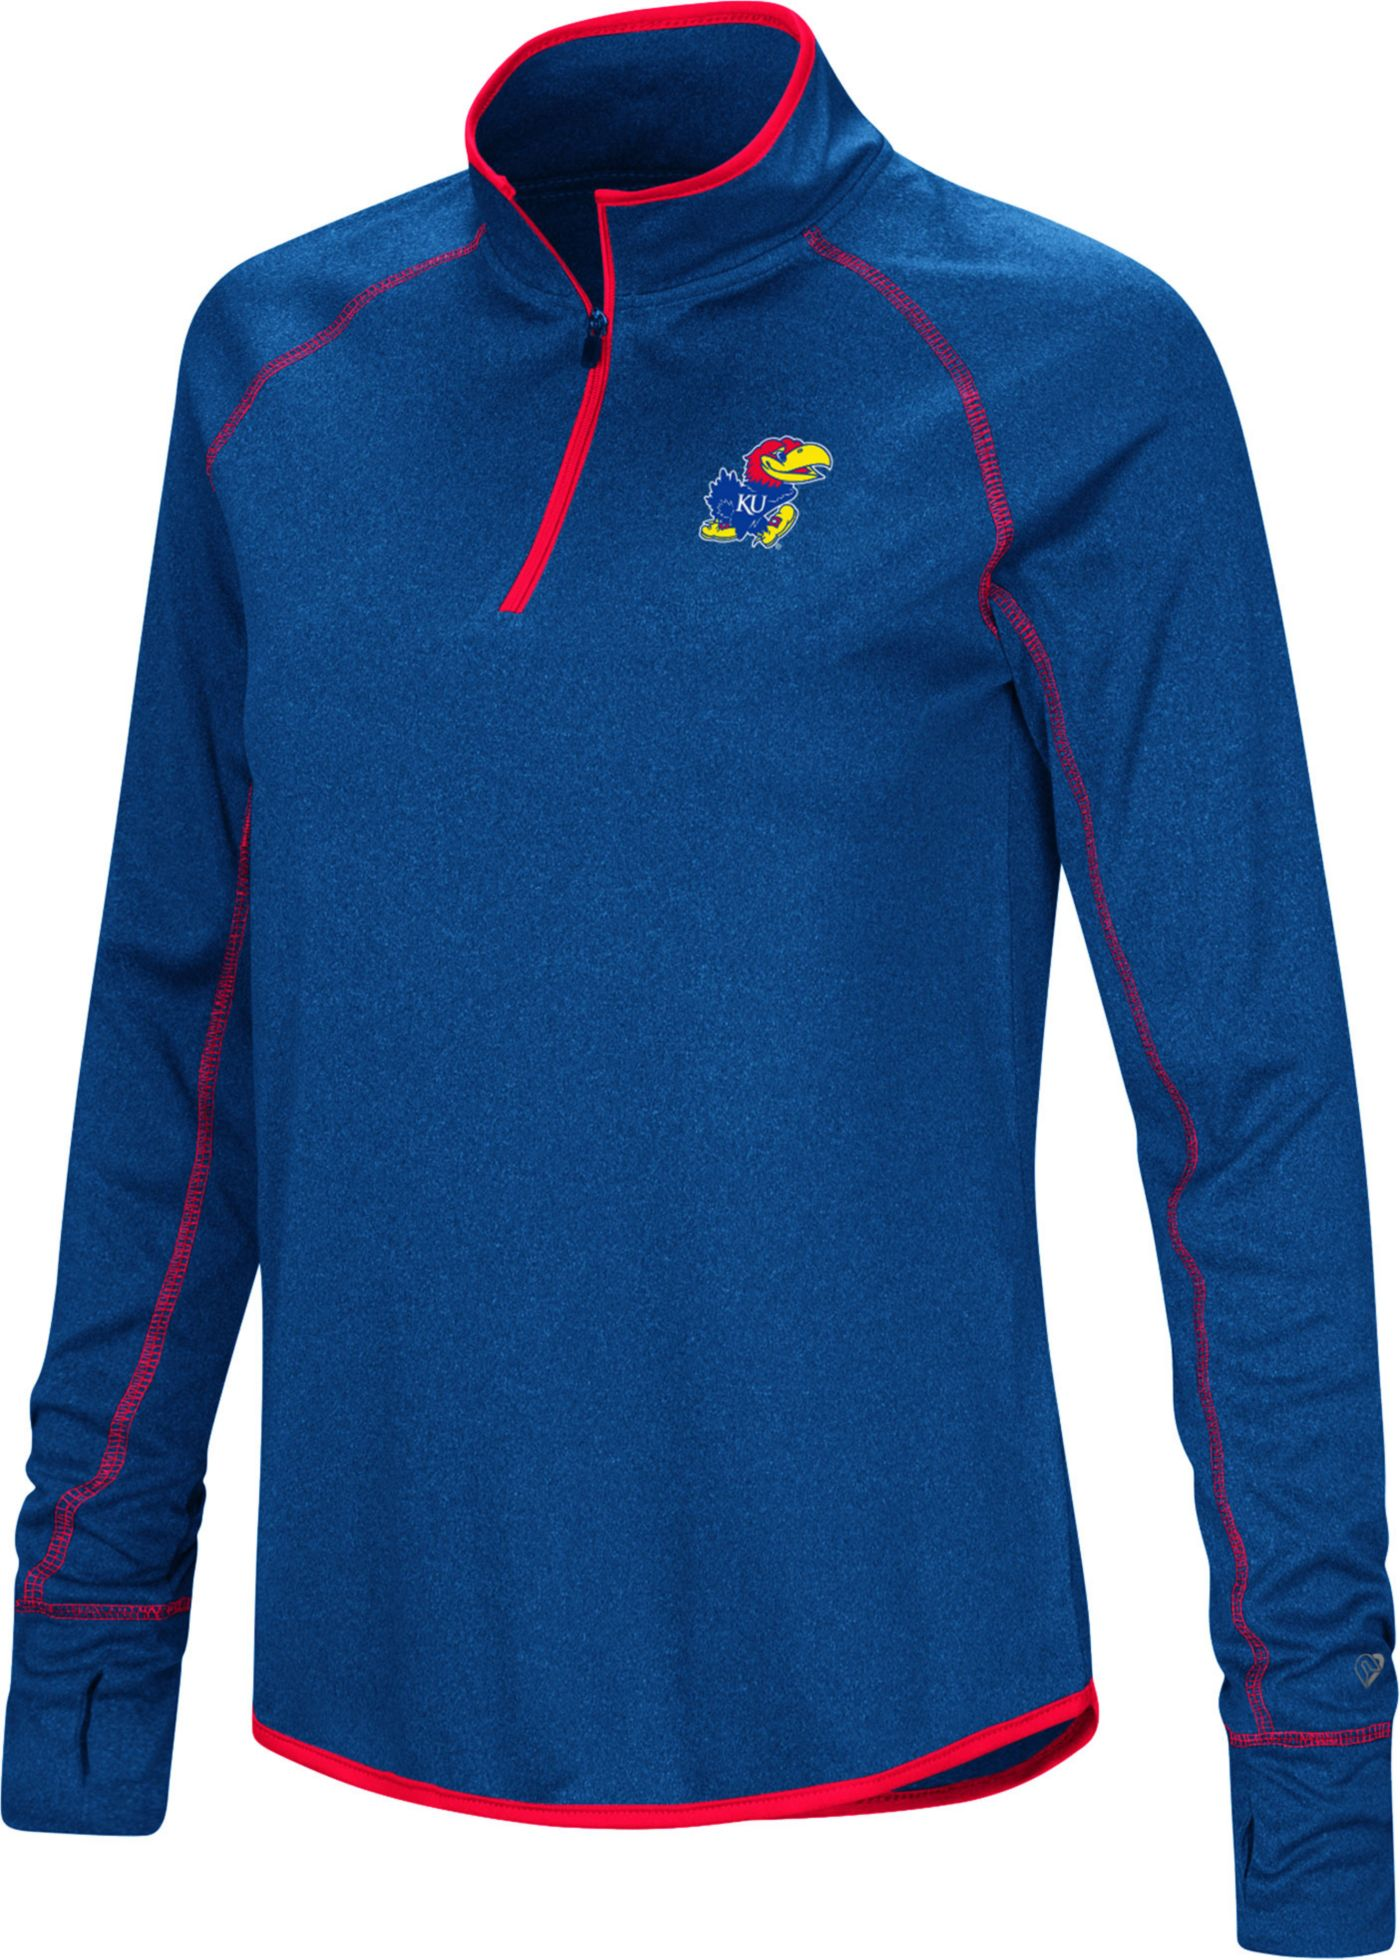 Colosseum Women's Kansas Jayhawks Blue Stingray Quarter-Zip Shirt